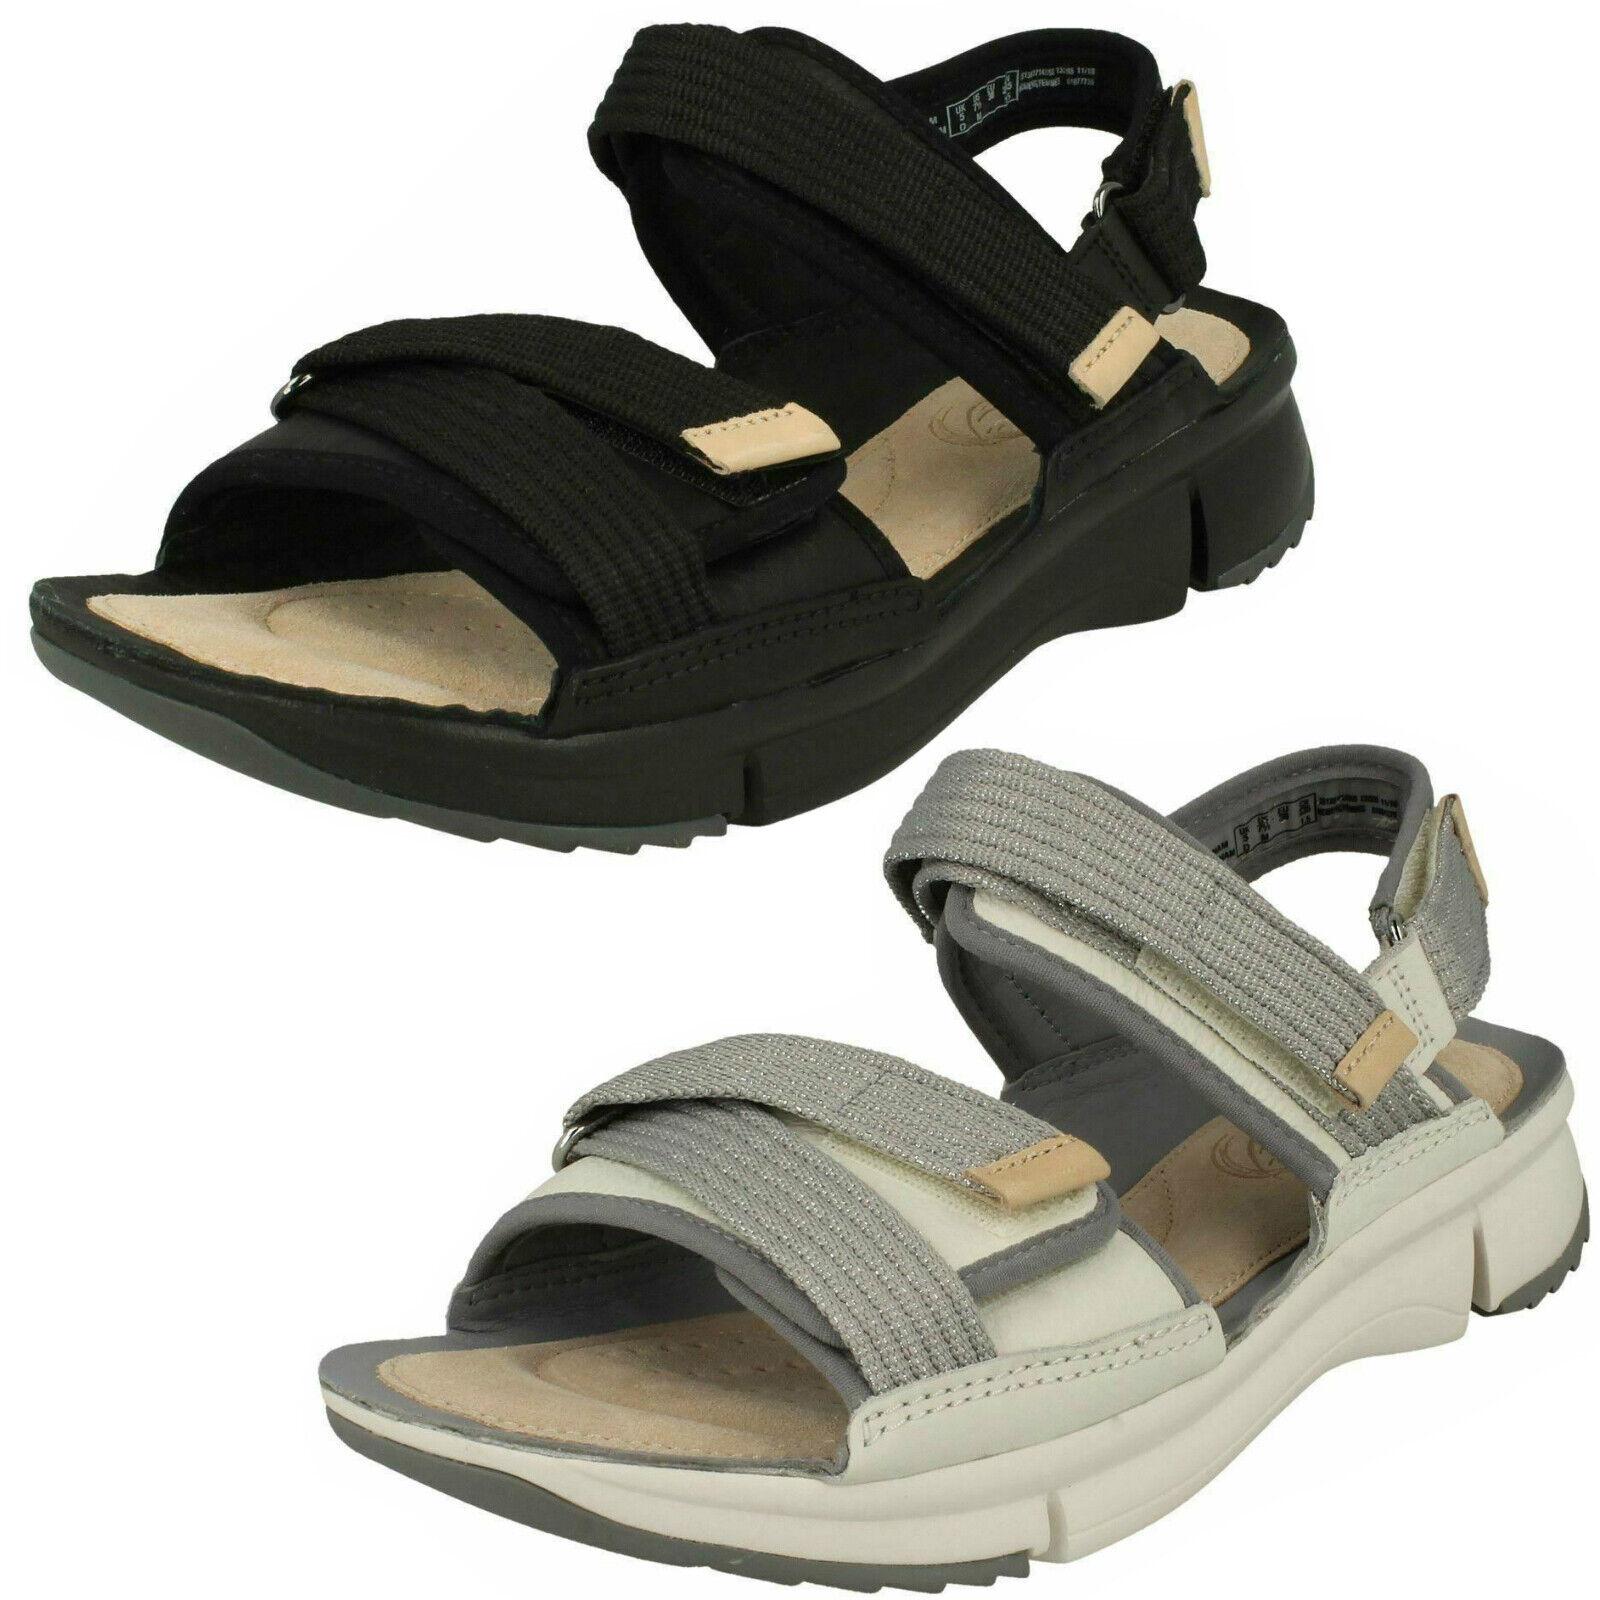 Femmes Clarks Tri Walk Noir Ou Blanc Cuir Sandales Casual-D Fitting